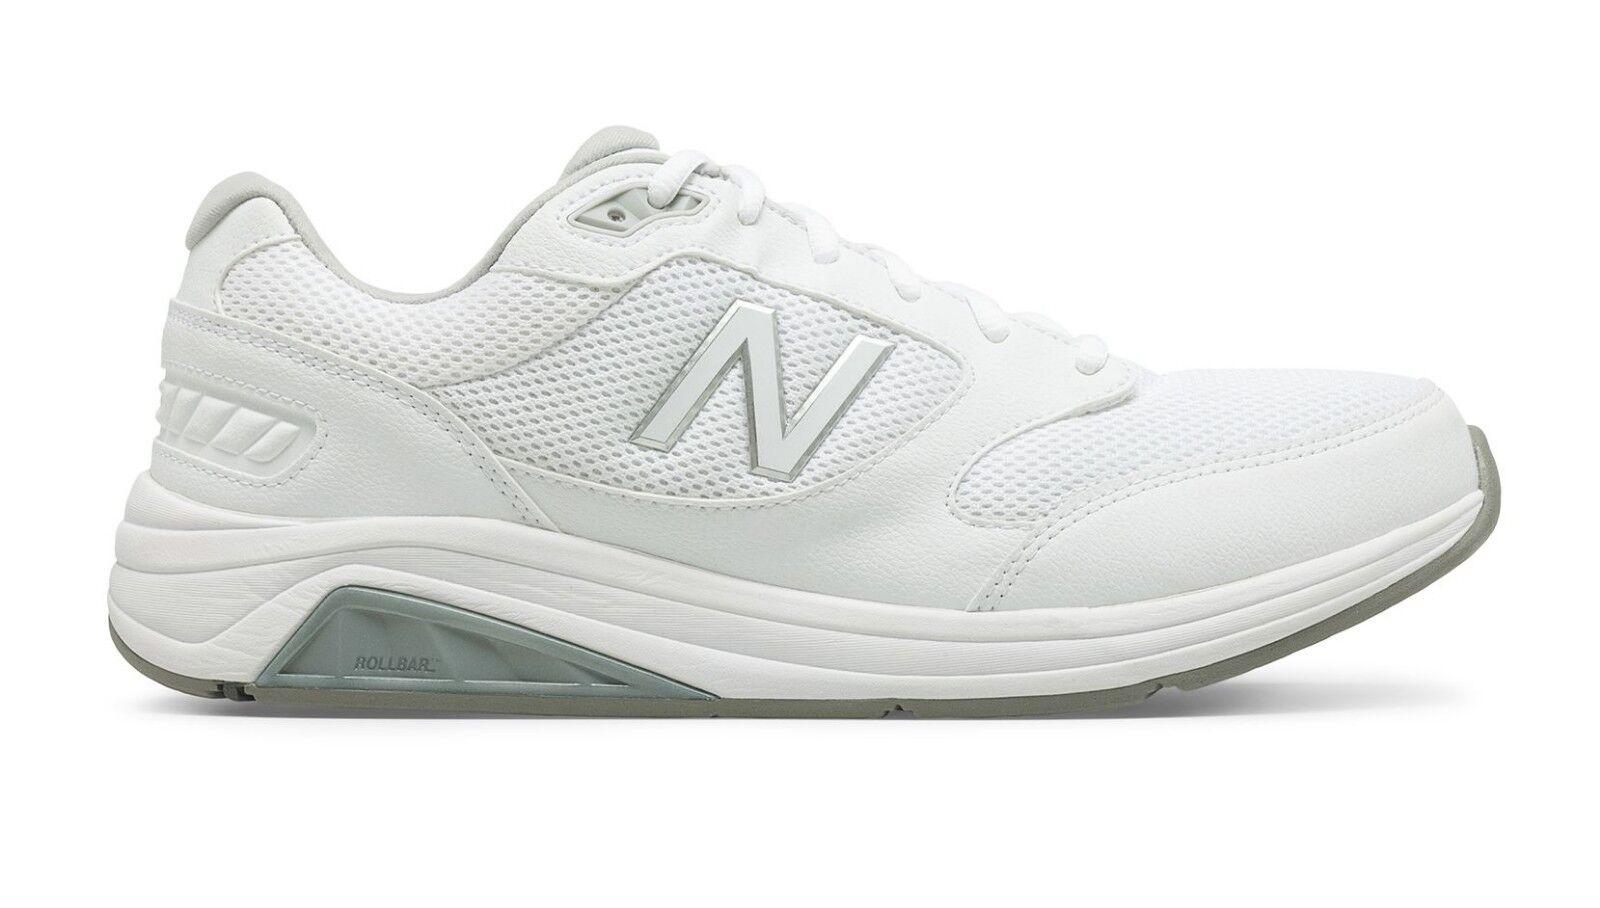 New Balance MW928WM3 Men's 928Hv3 White Mesh Athletic Walking Shoes